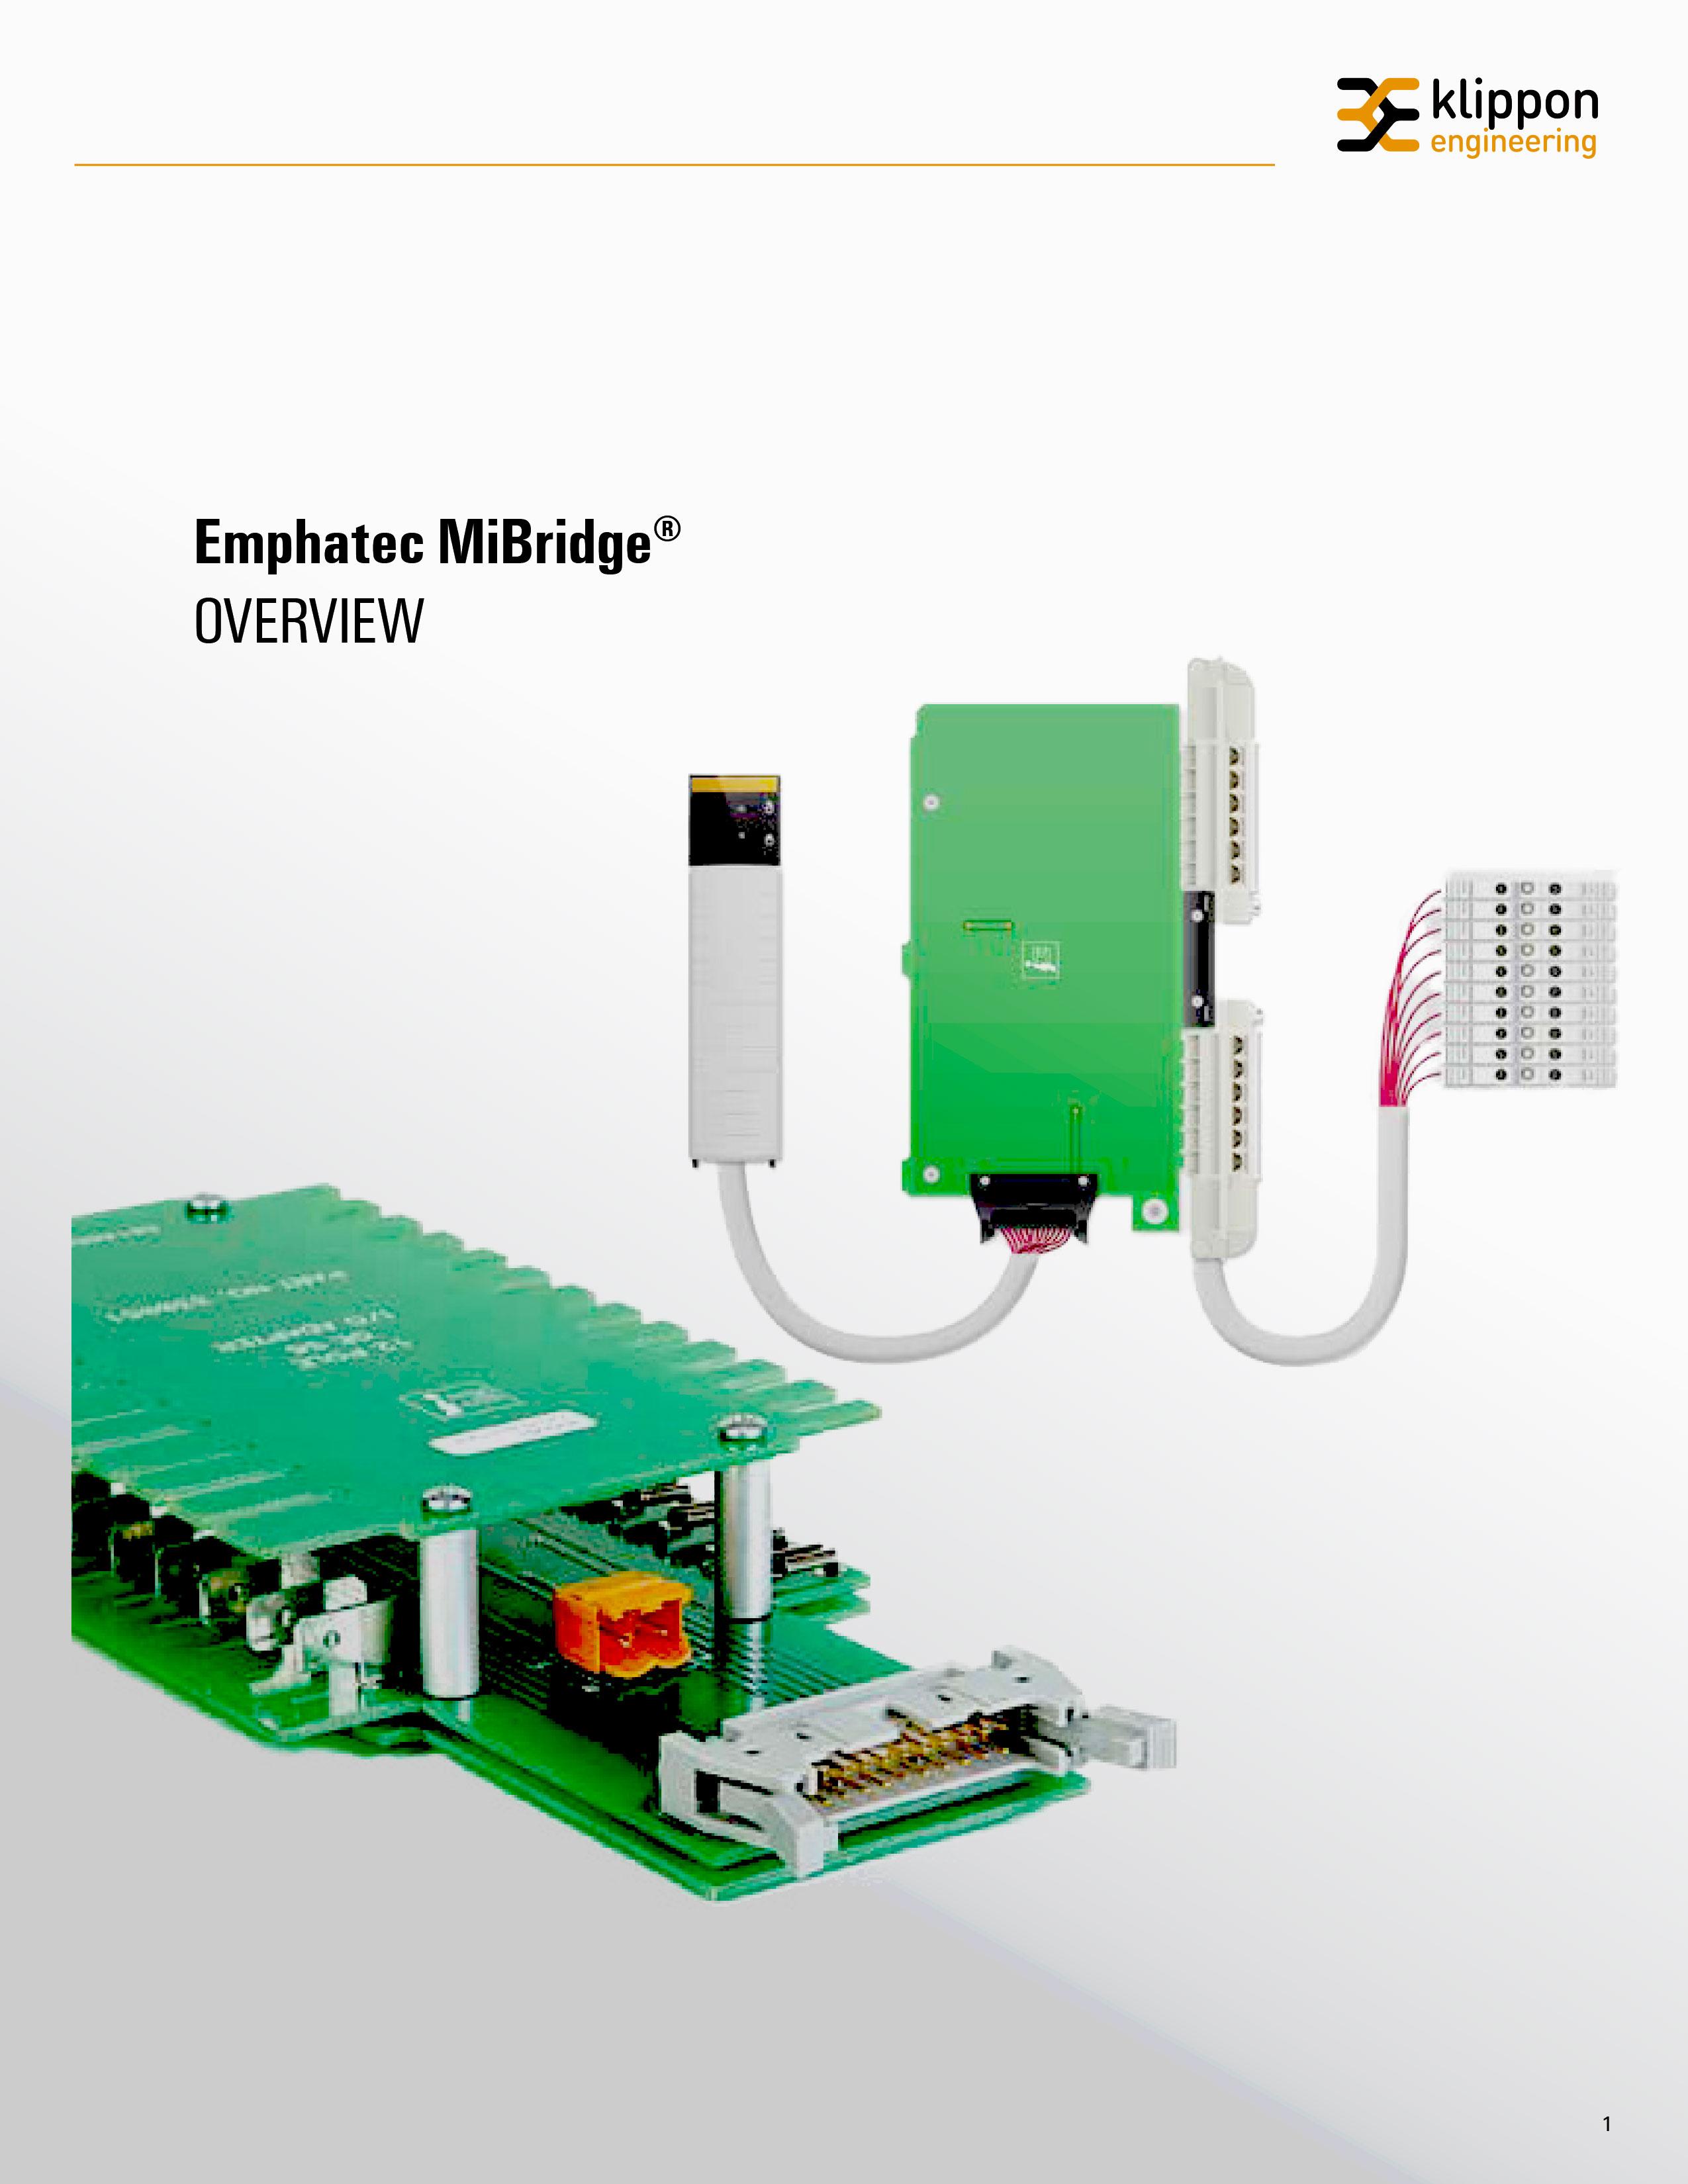 H-IPC620-AdapterTHMB.gif